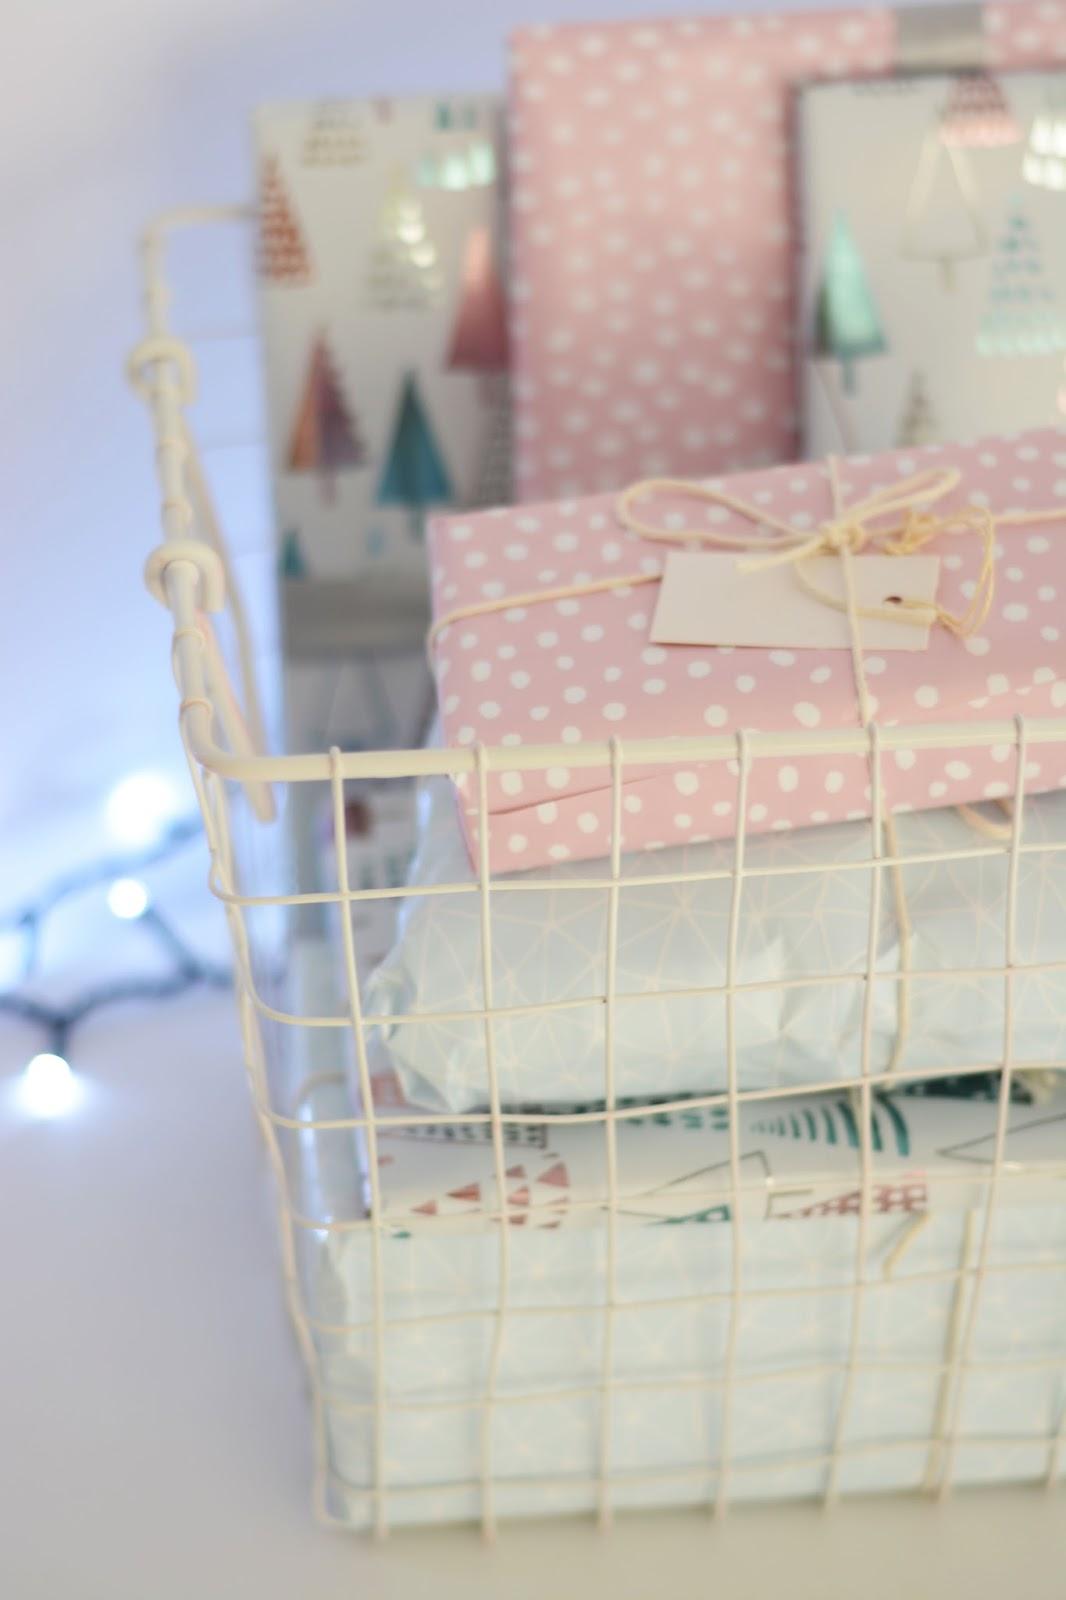 biały druciany kosz ikea, pastelowy papier Ikea Vinter